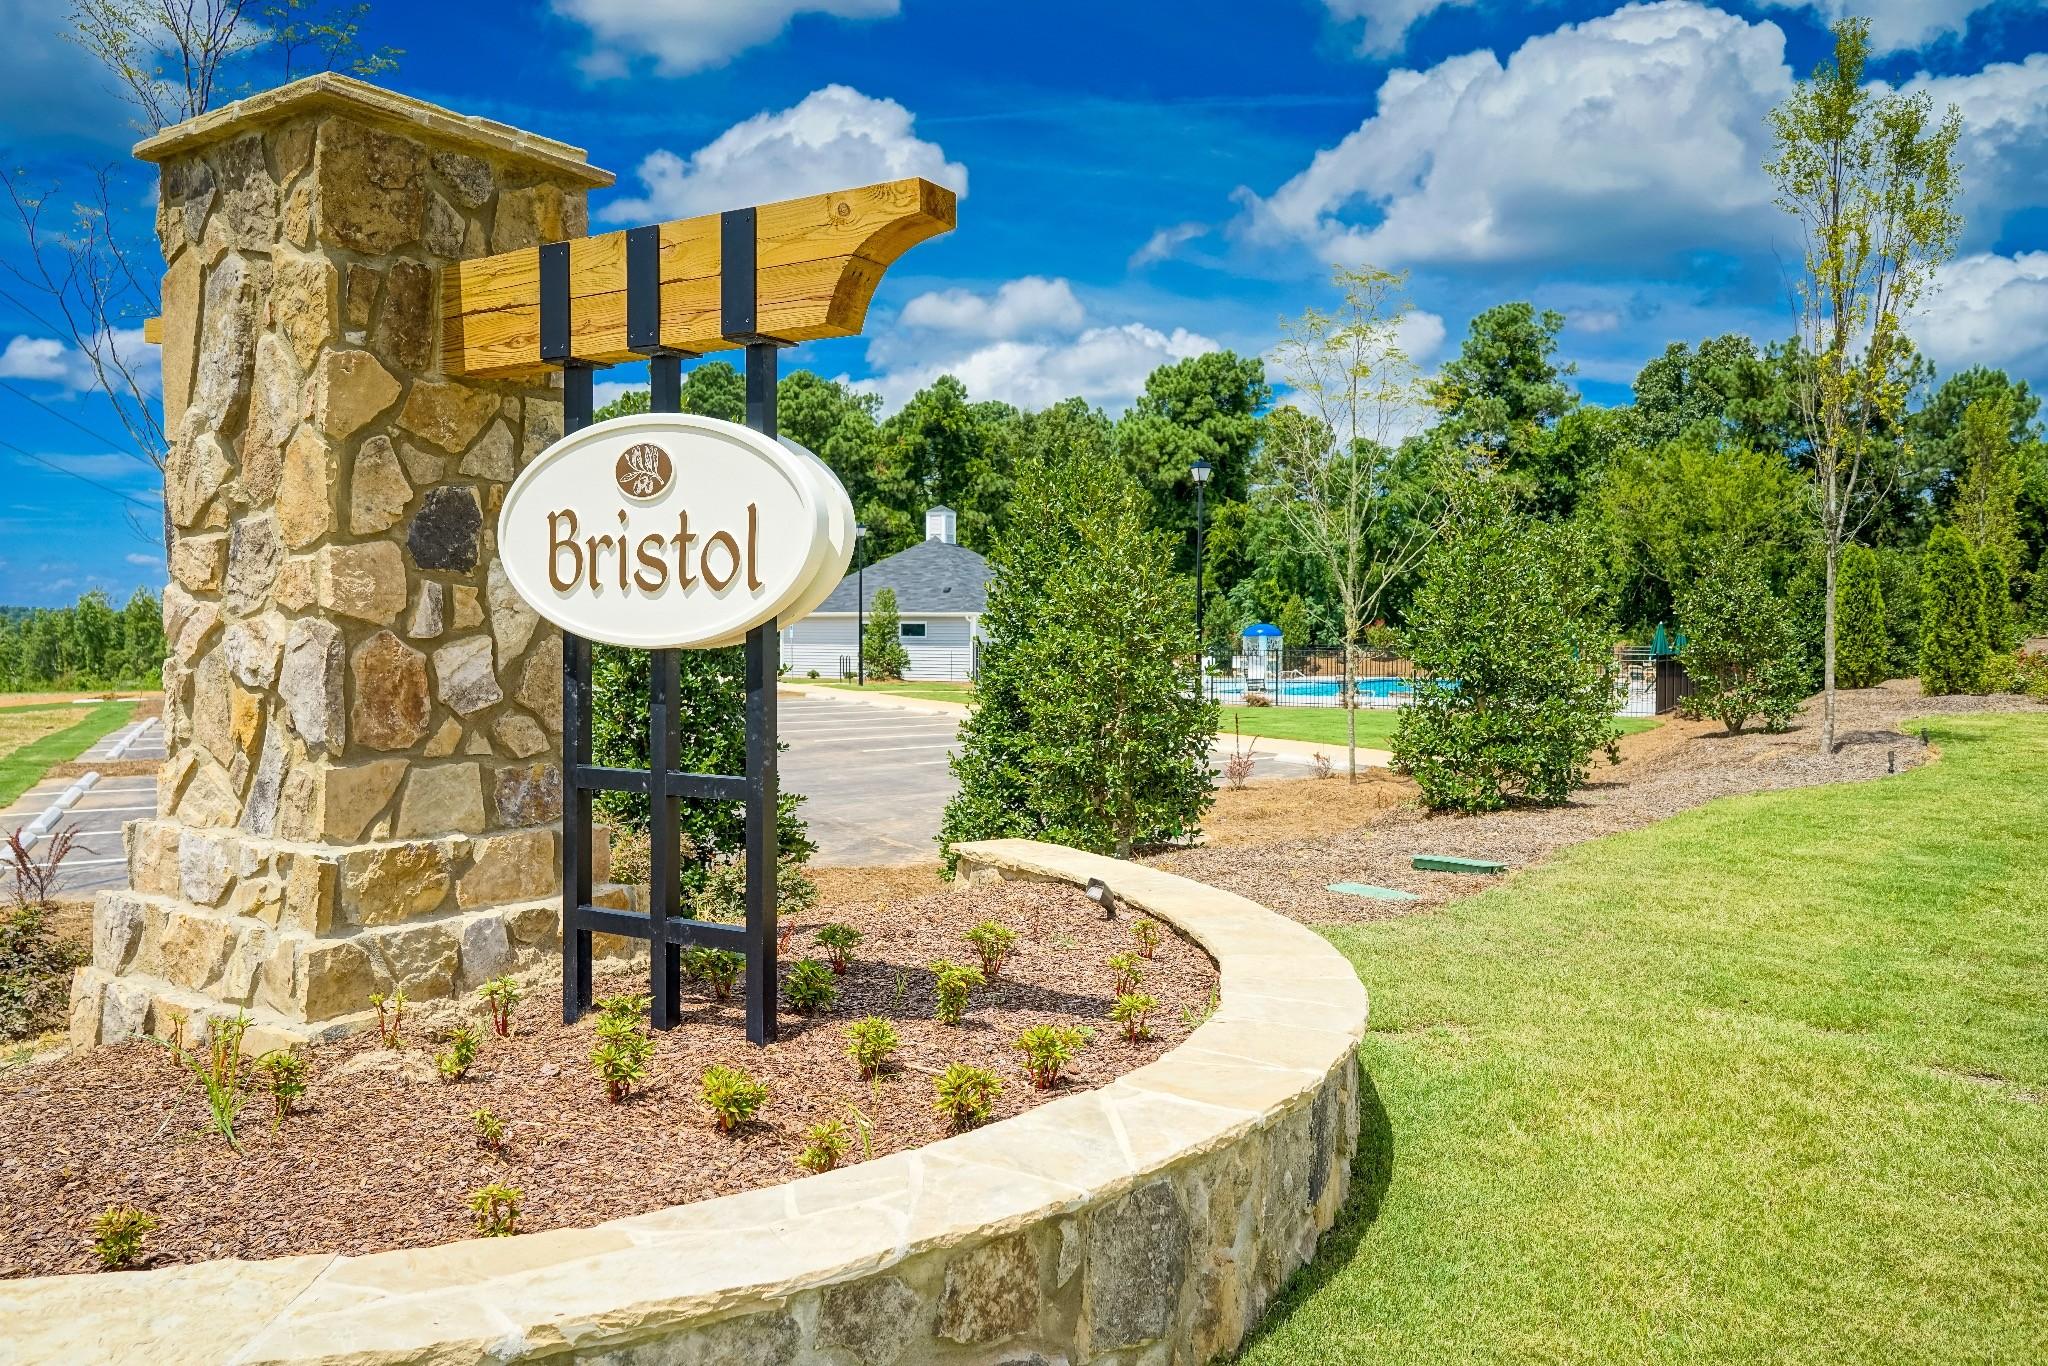 Bristol Community Entrance Sign in Clayton NC